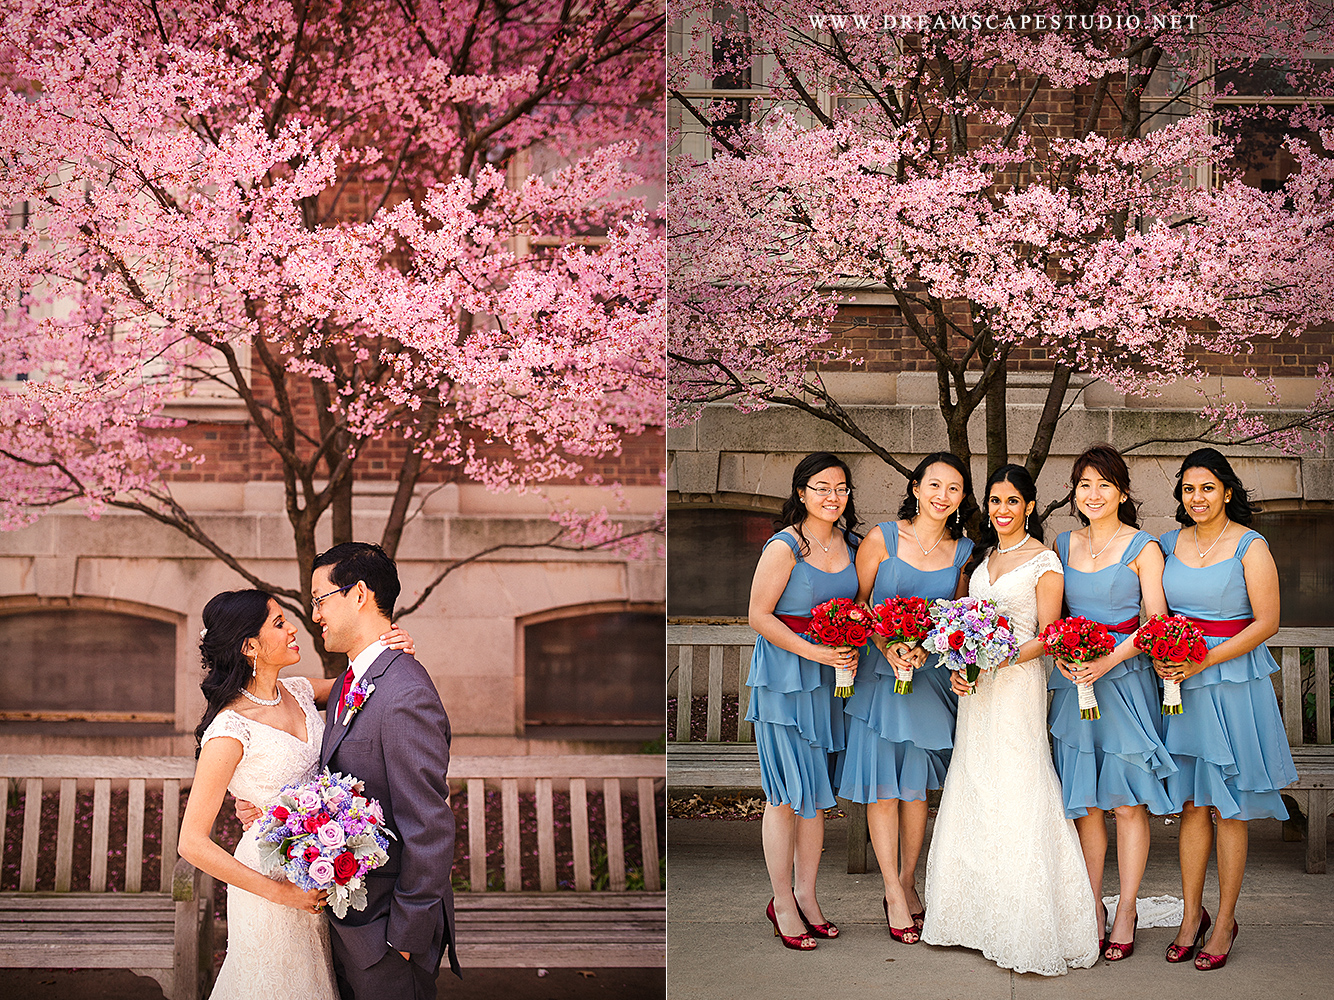 CT_Wedding_Photographer_PaHe_Blog_11.jpg